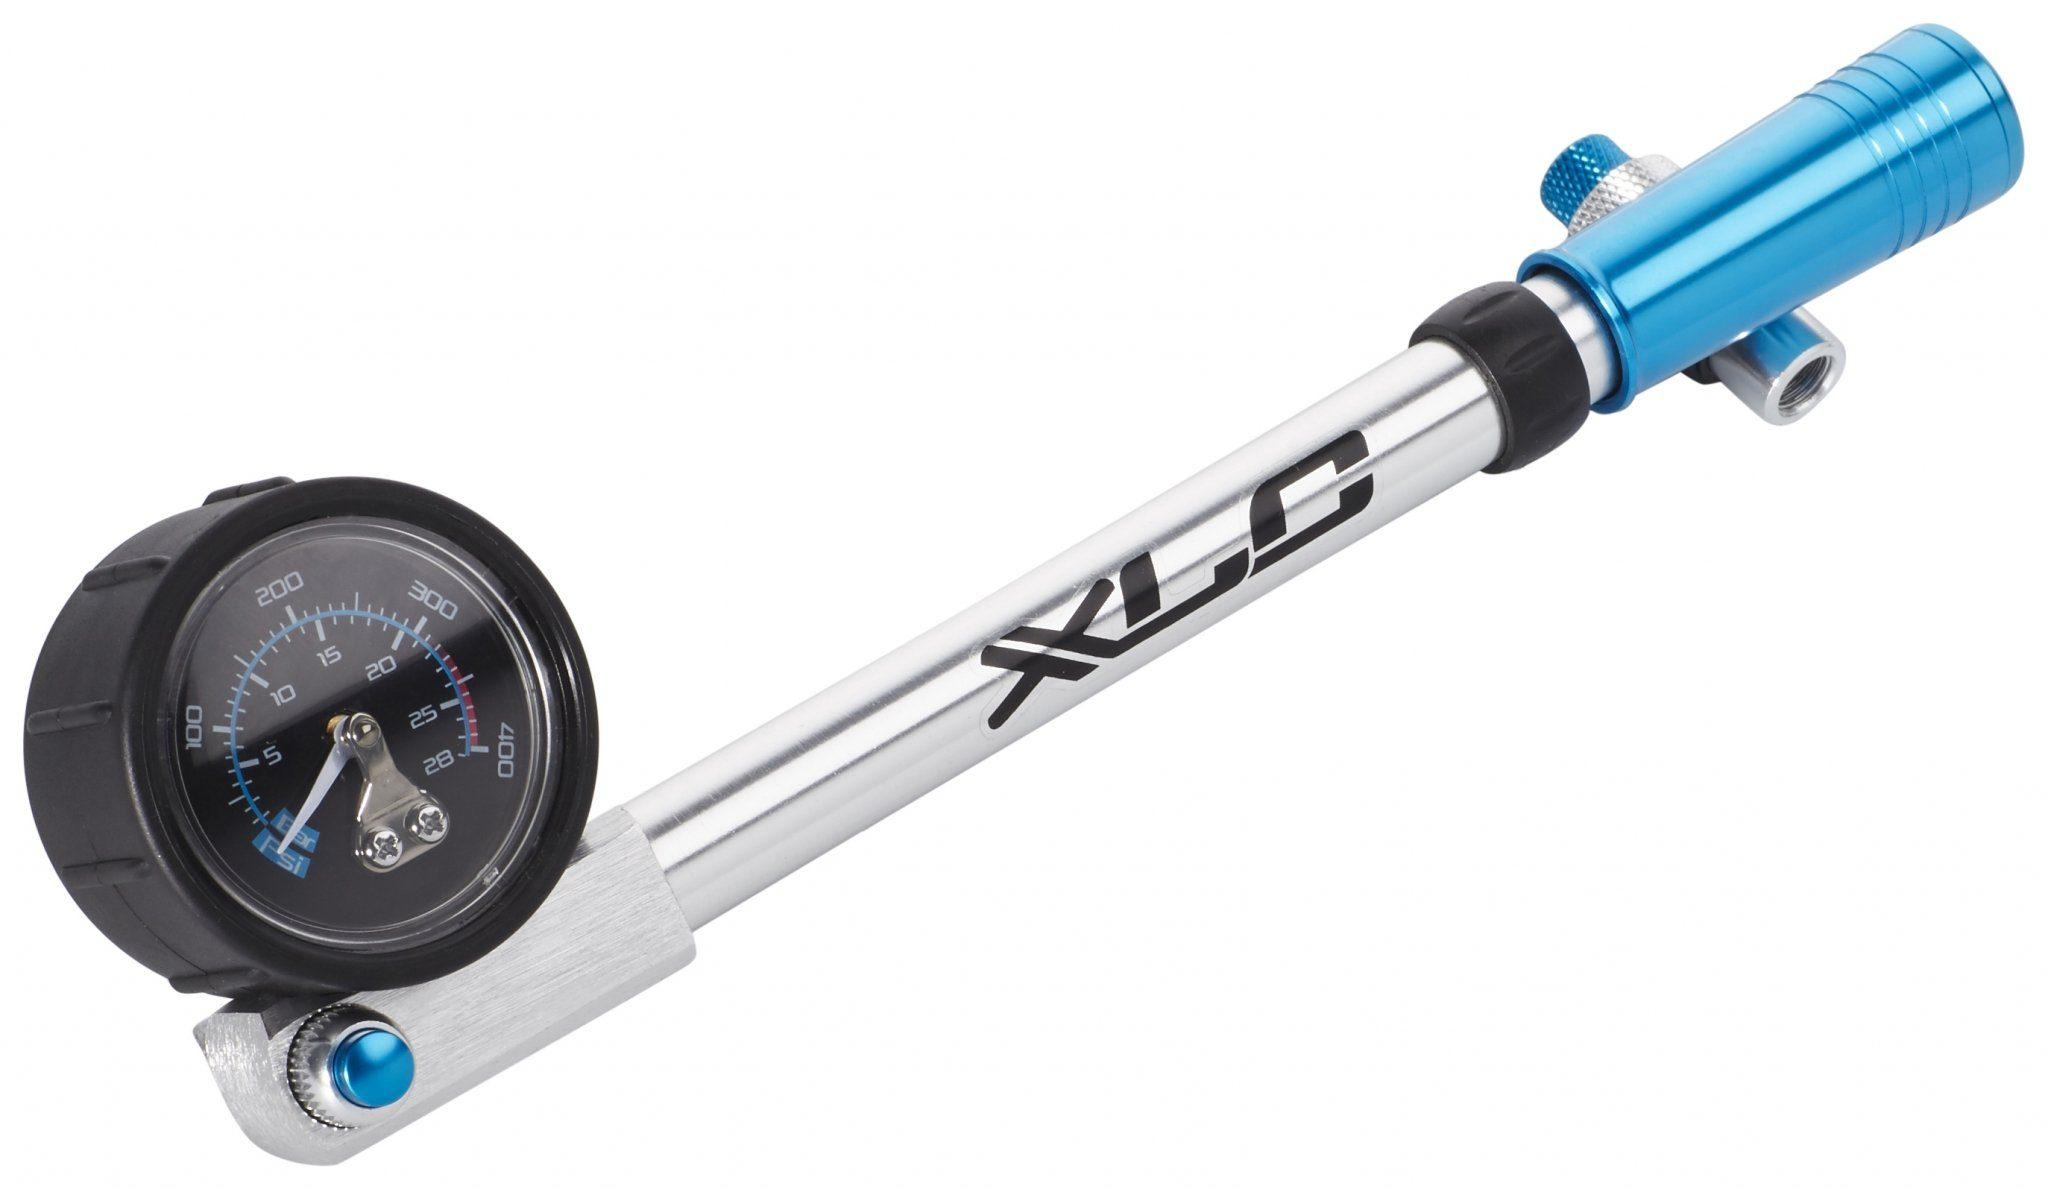 XLC Fahrradpumpe »XLC HighAir Pro PU-H03 Dämpferpumpe«